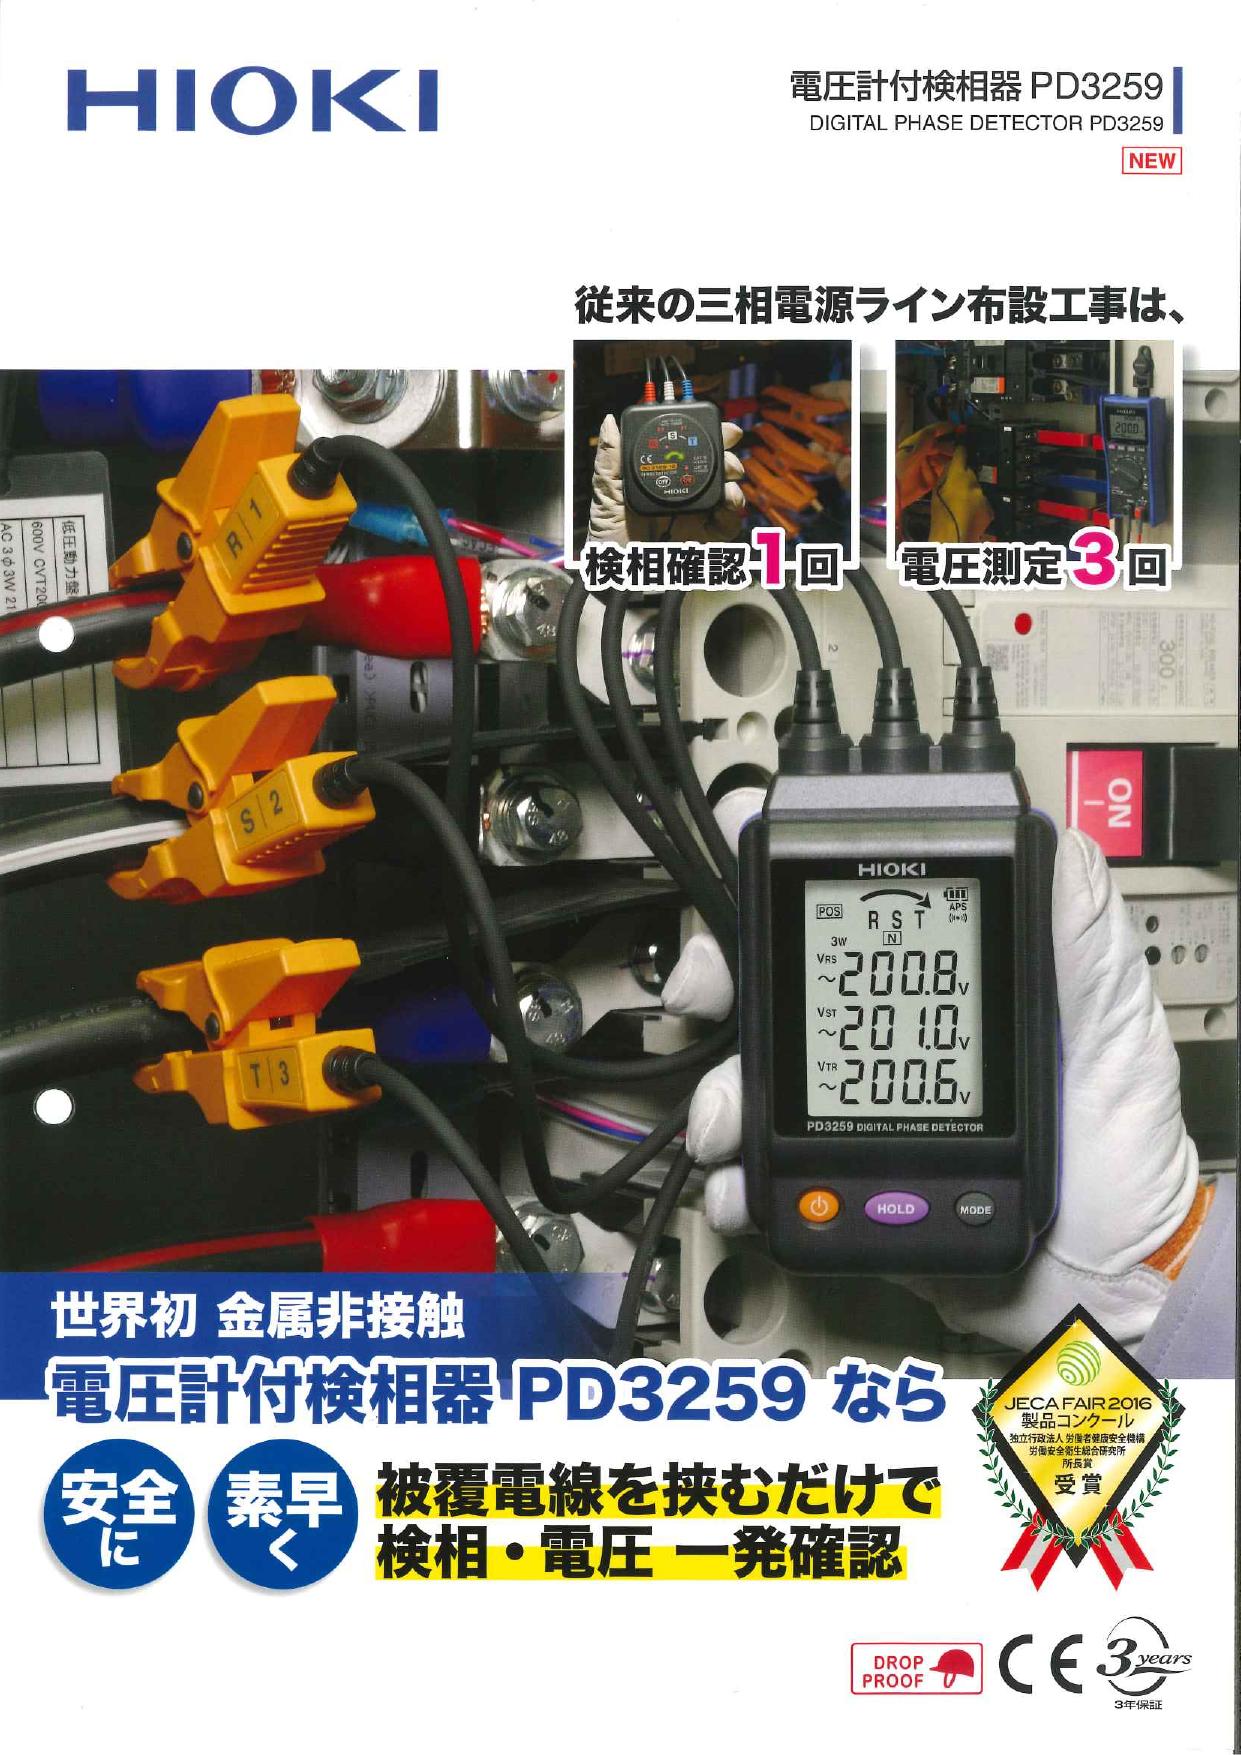 三相電源ライン布設工事に 金属非接触 電圧計付検相器 PD3259